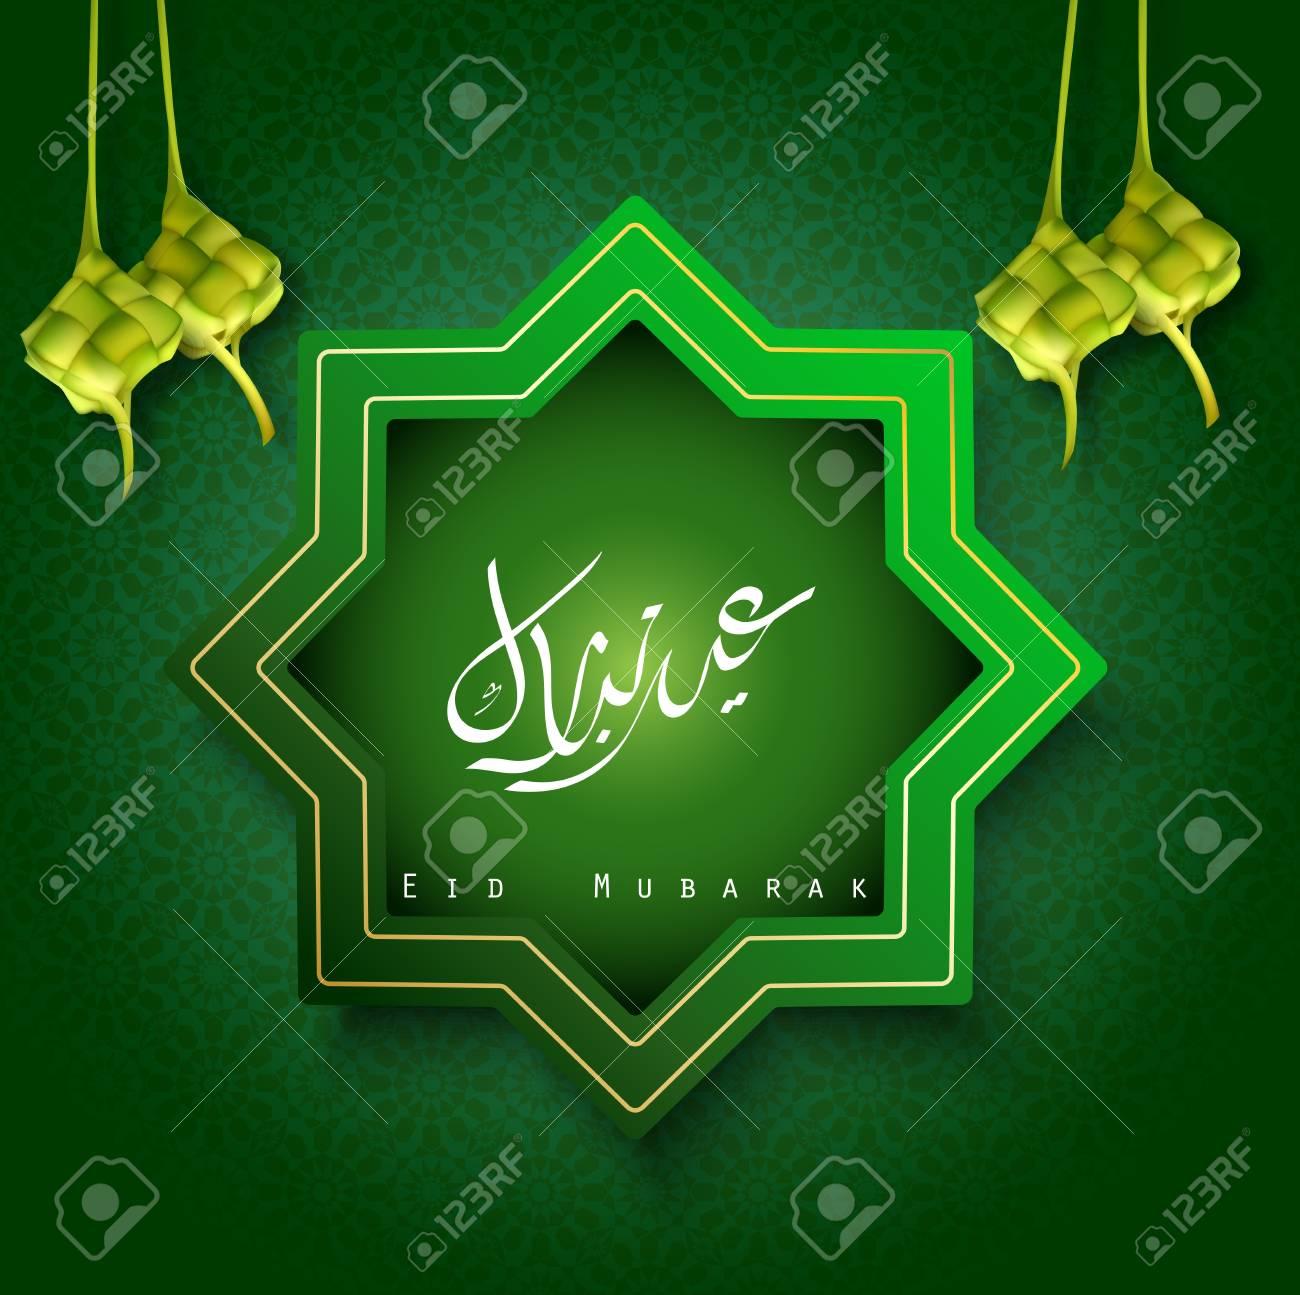 Islamic greeting card eid mubarak banner background with arabic islamic greeting card eid mubarak banner background with arabic calligraphy and hanging ketupat stock photo m4hsunfo